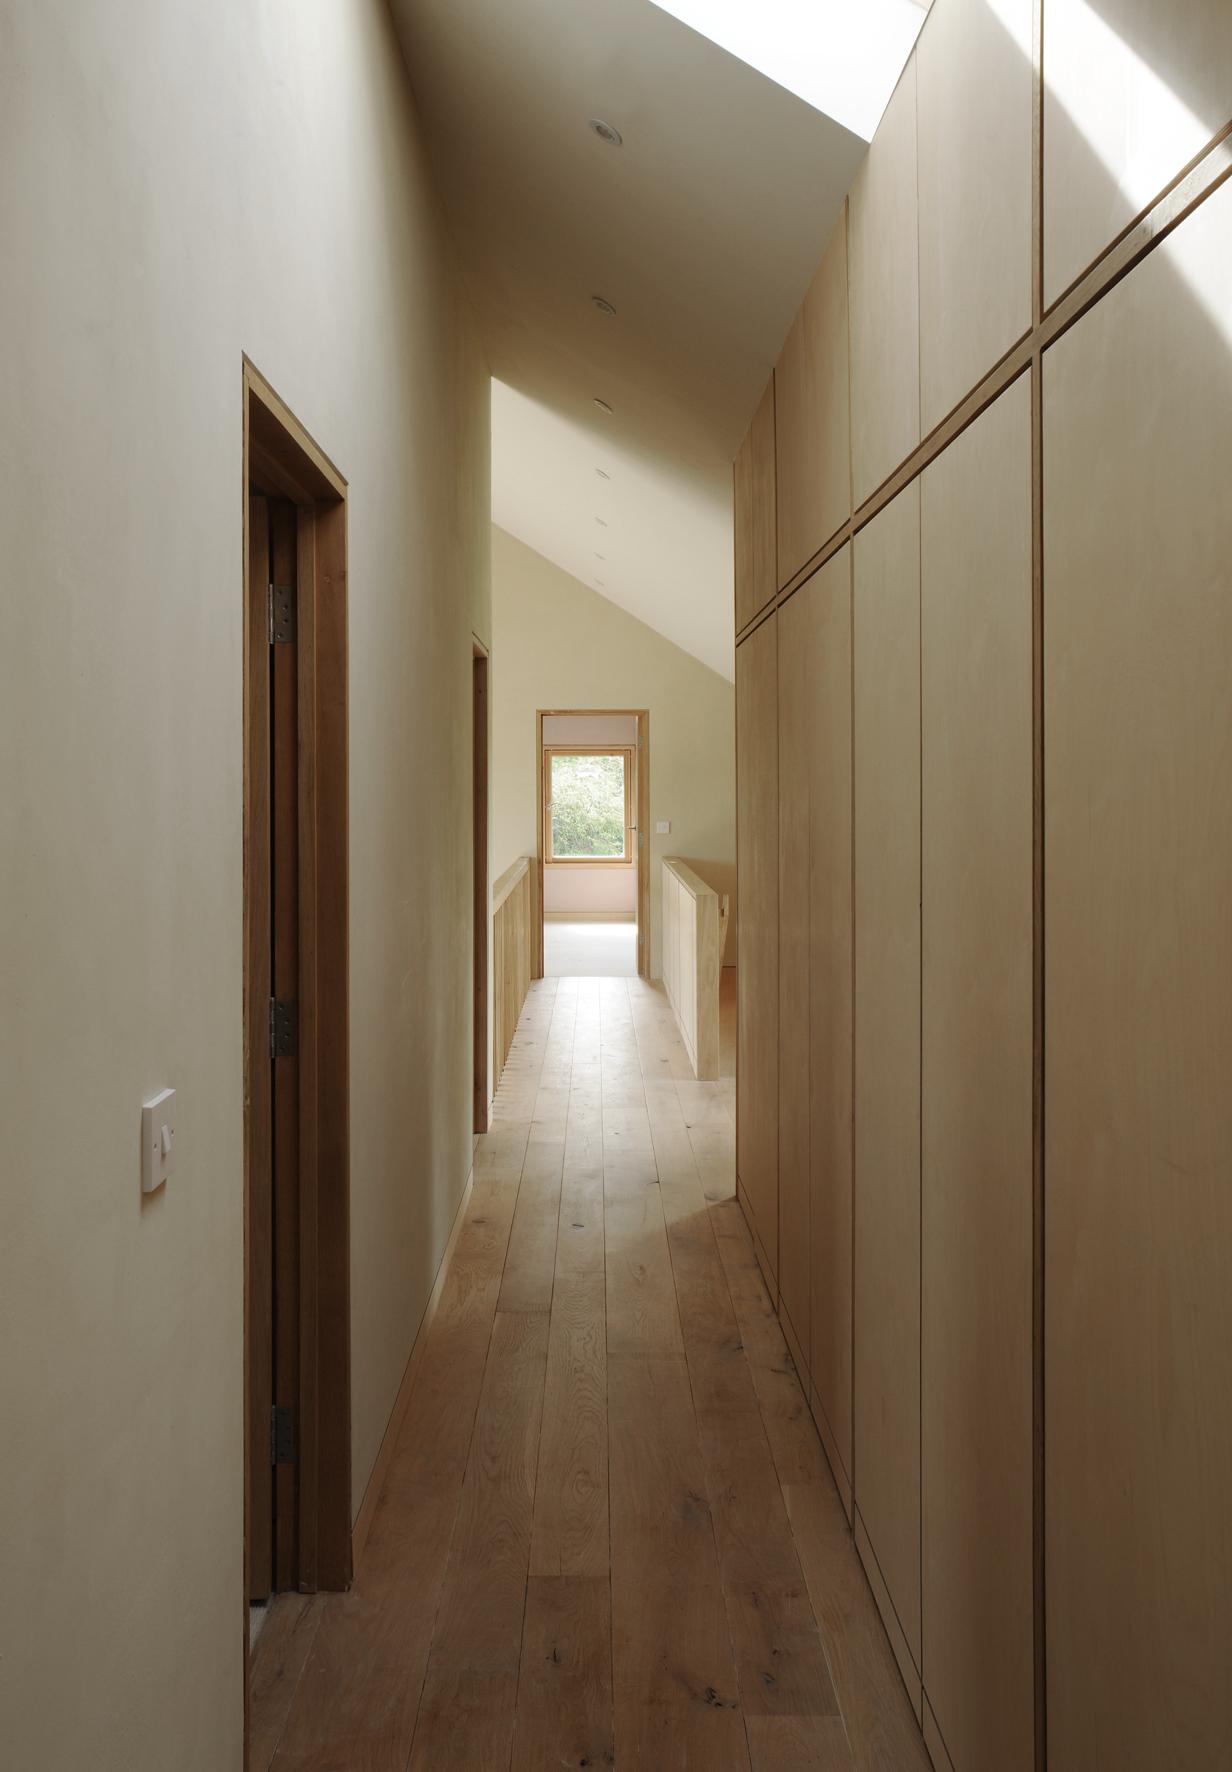 Interior - hallway (c) David Grandorge